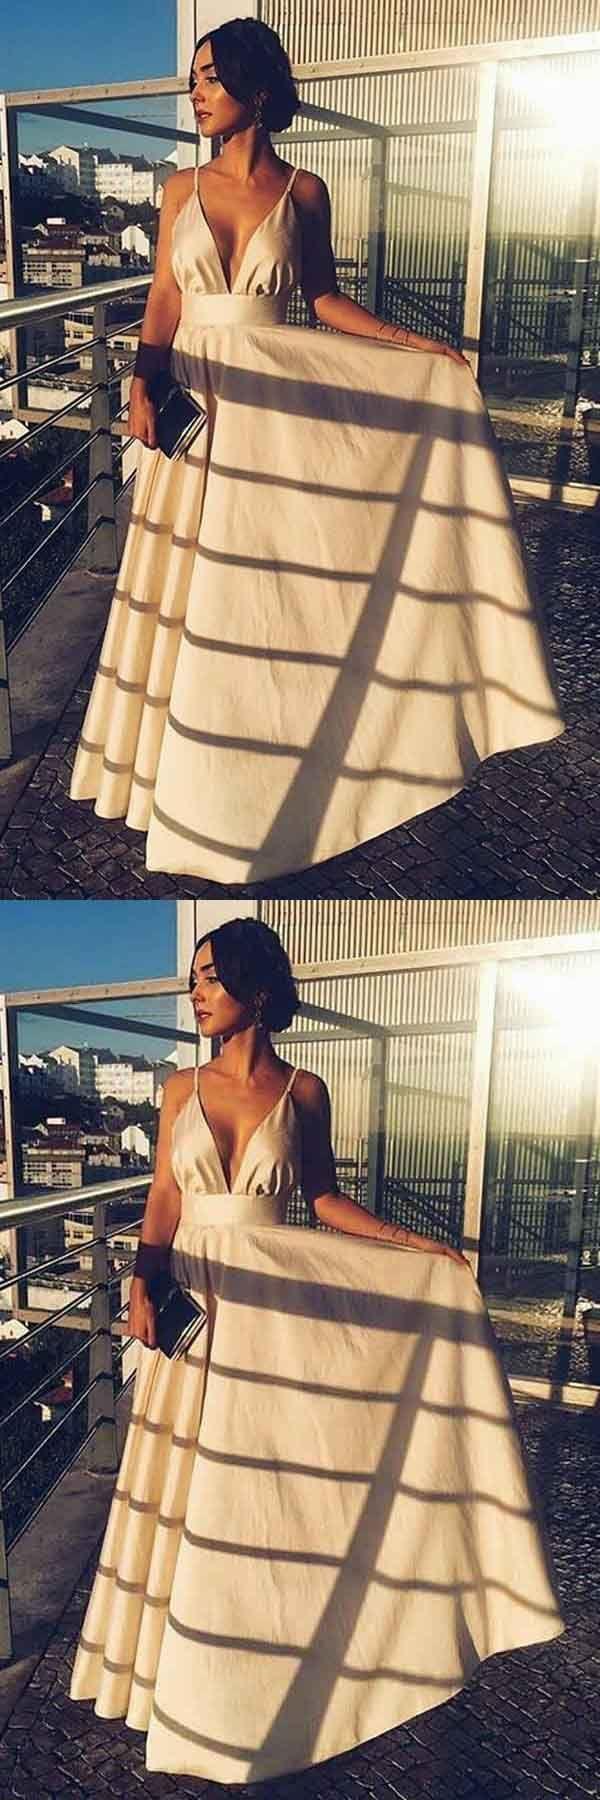 [168.59]  Charmig Tulle & Satin Bateau Halsband A-line Bröllopsklänningar med Spetsapplikationer